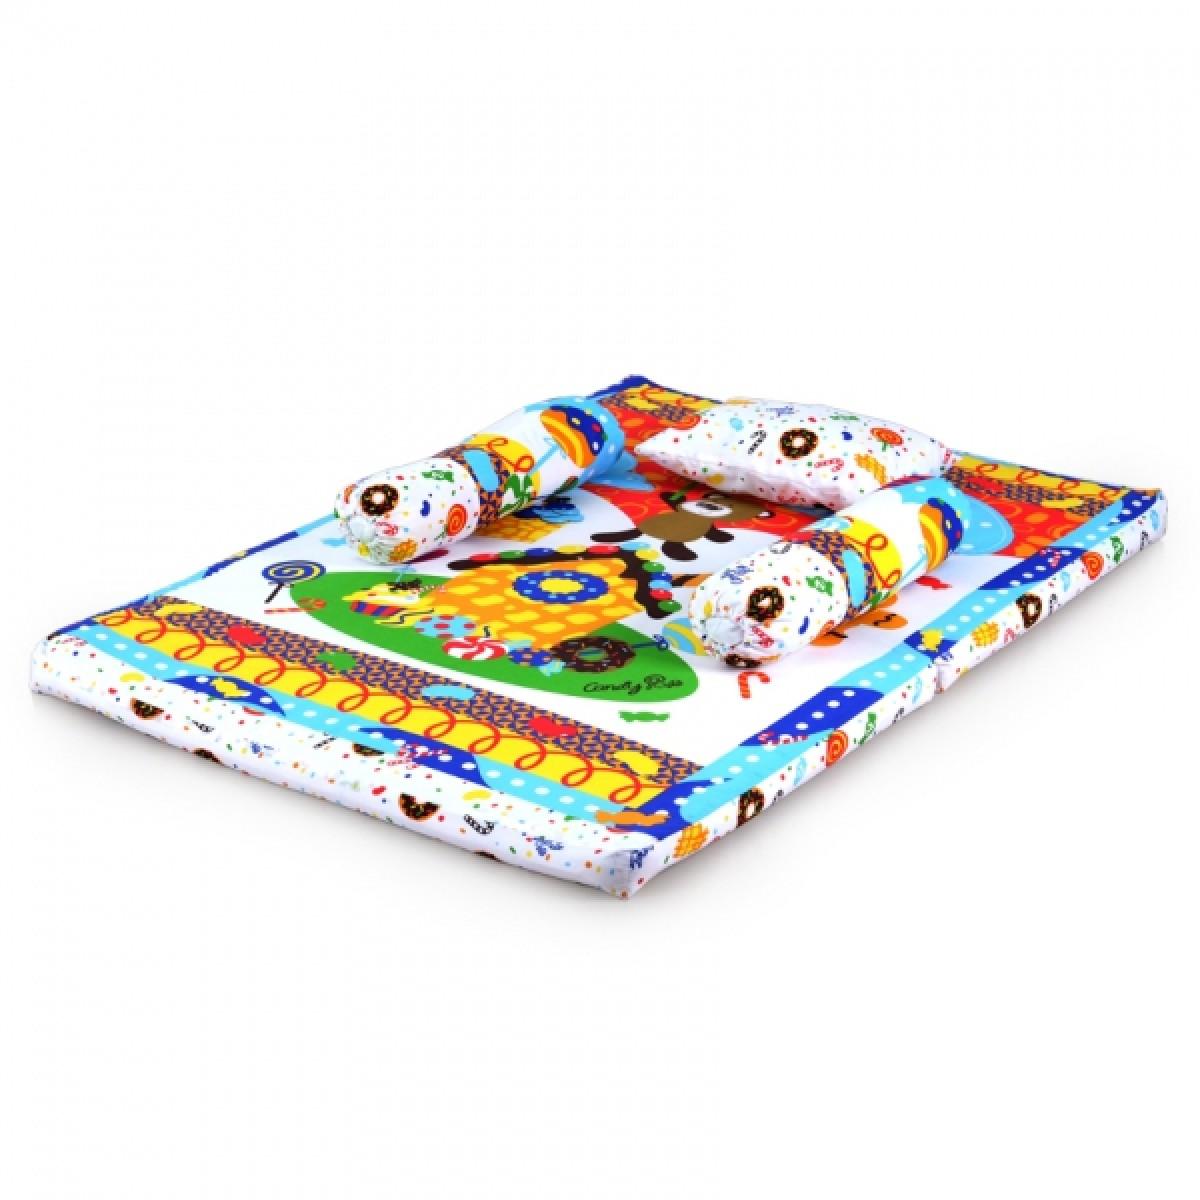 Fordable Playpen Mattress Swet - Kico Baby Center